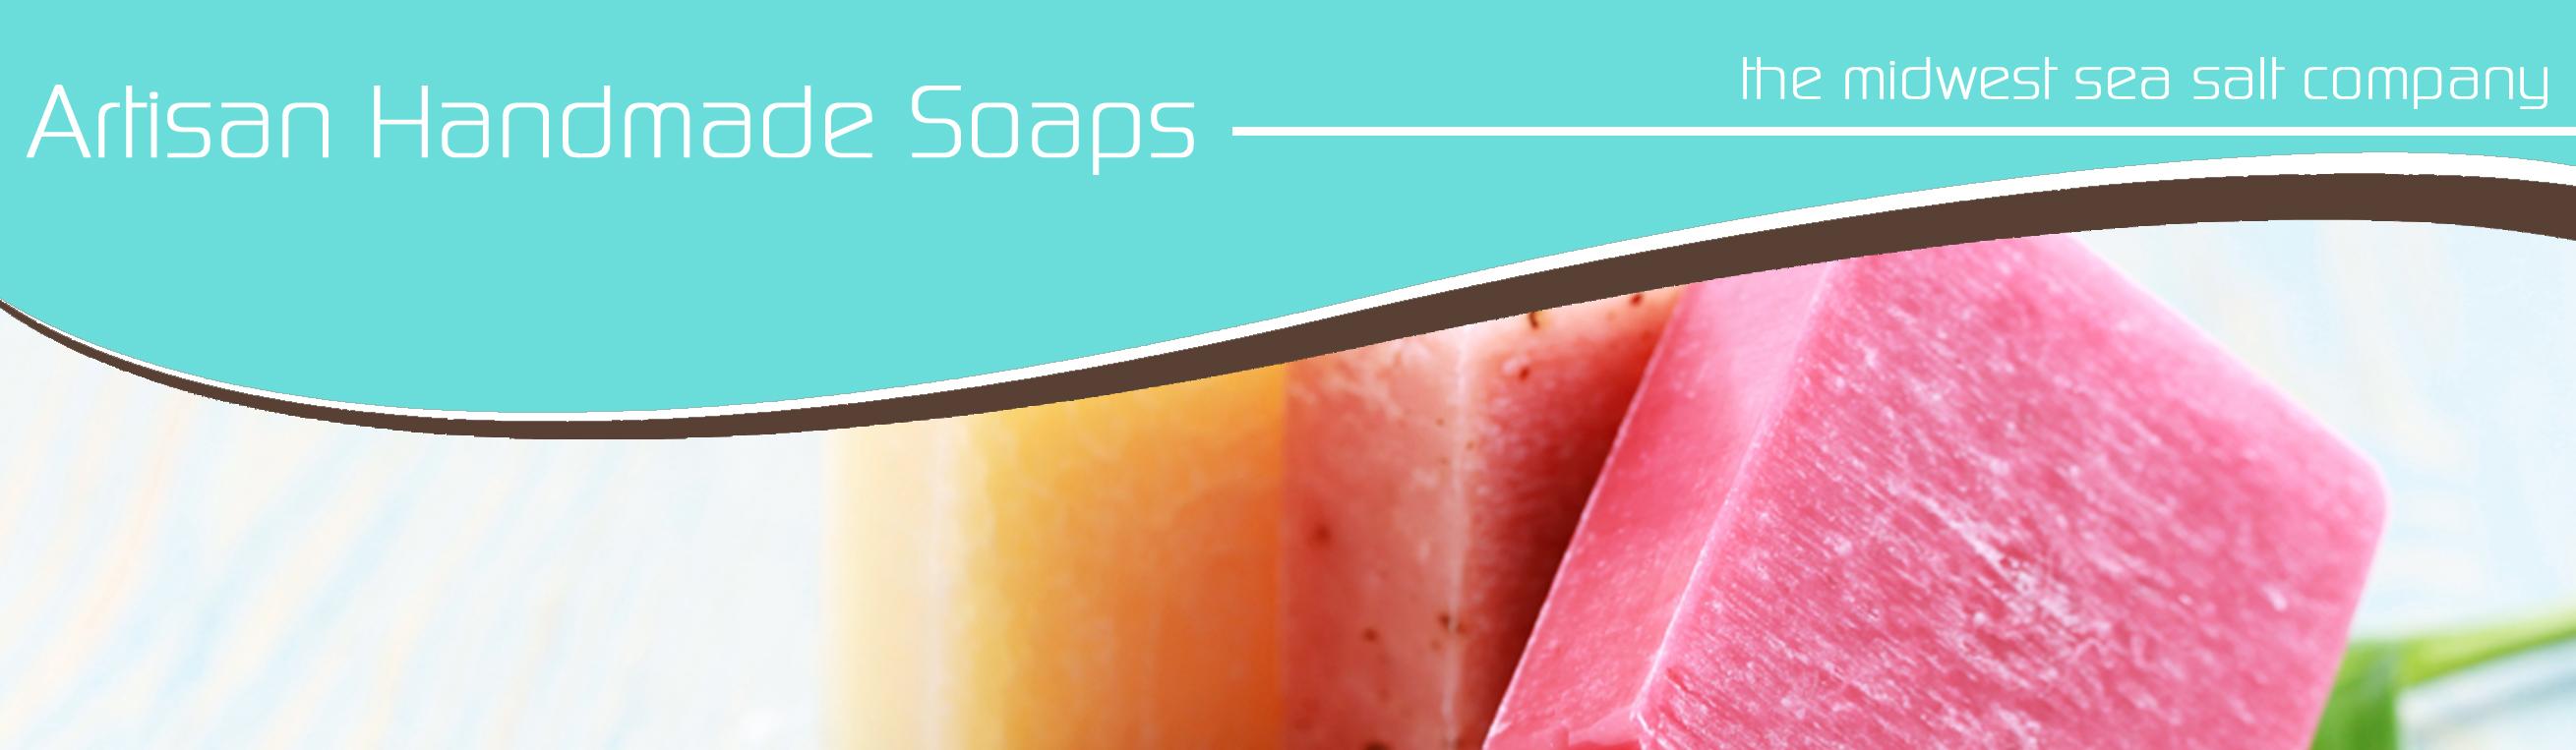 artisan-handmade-soaps-midwest-sea-salt-company.jpg